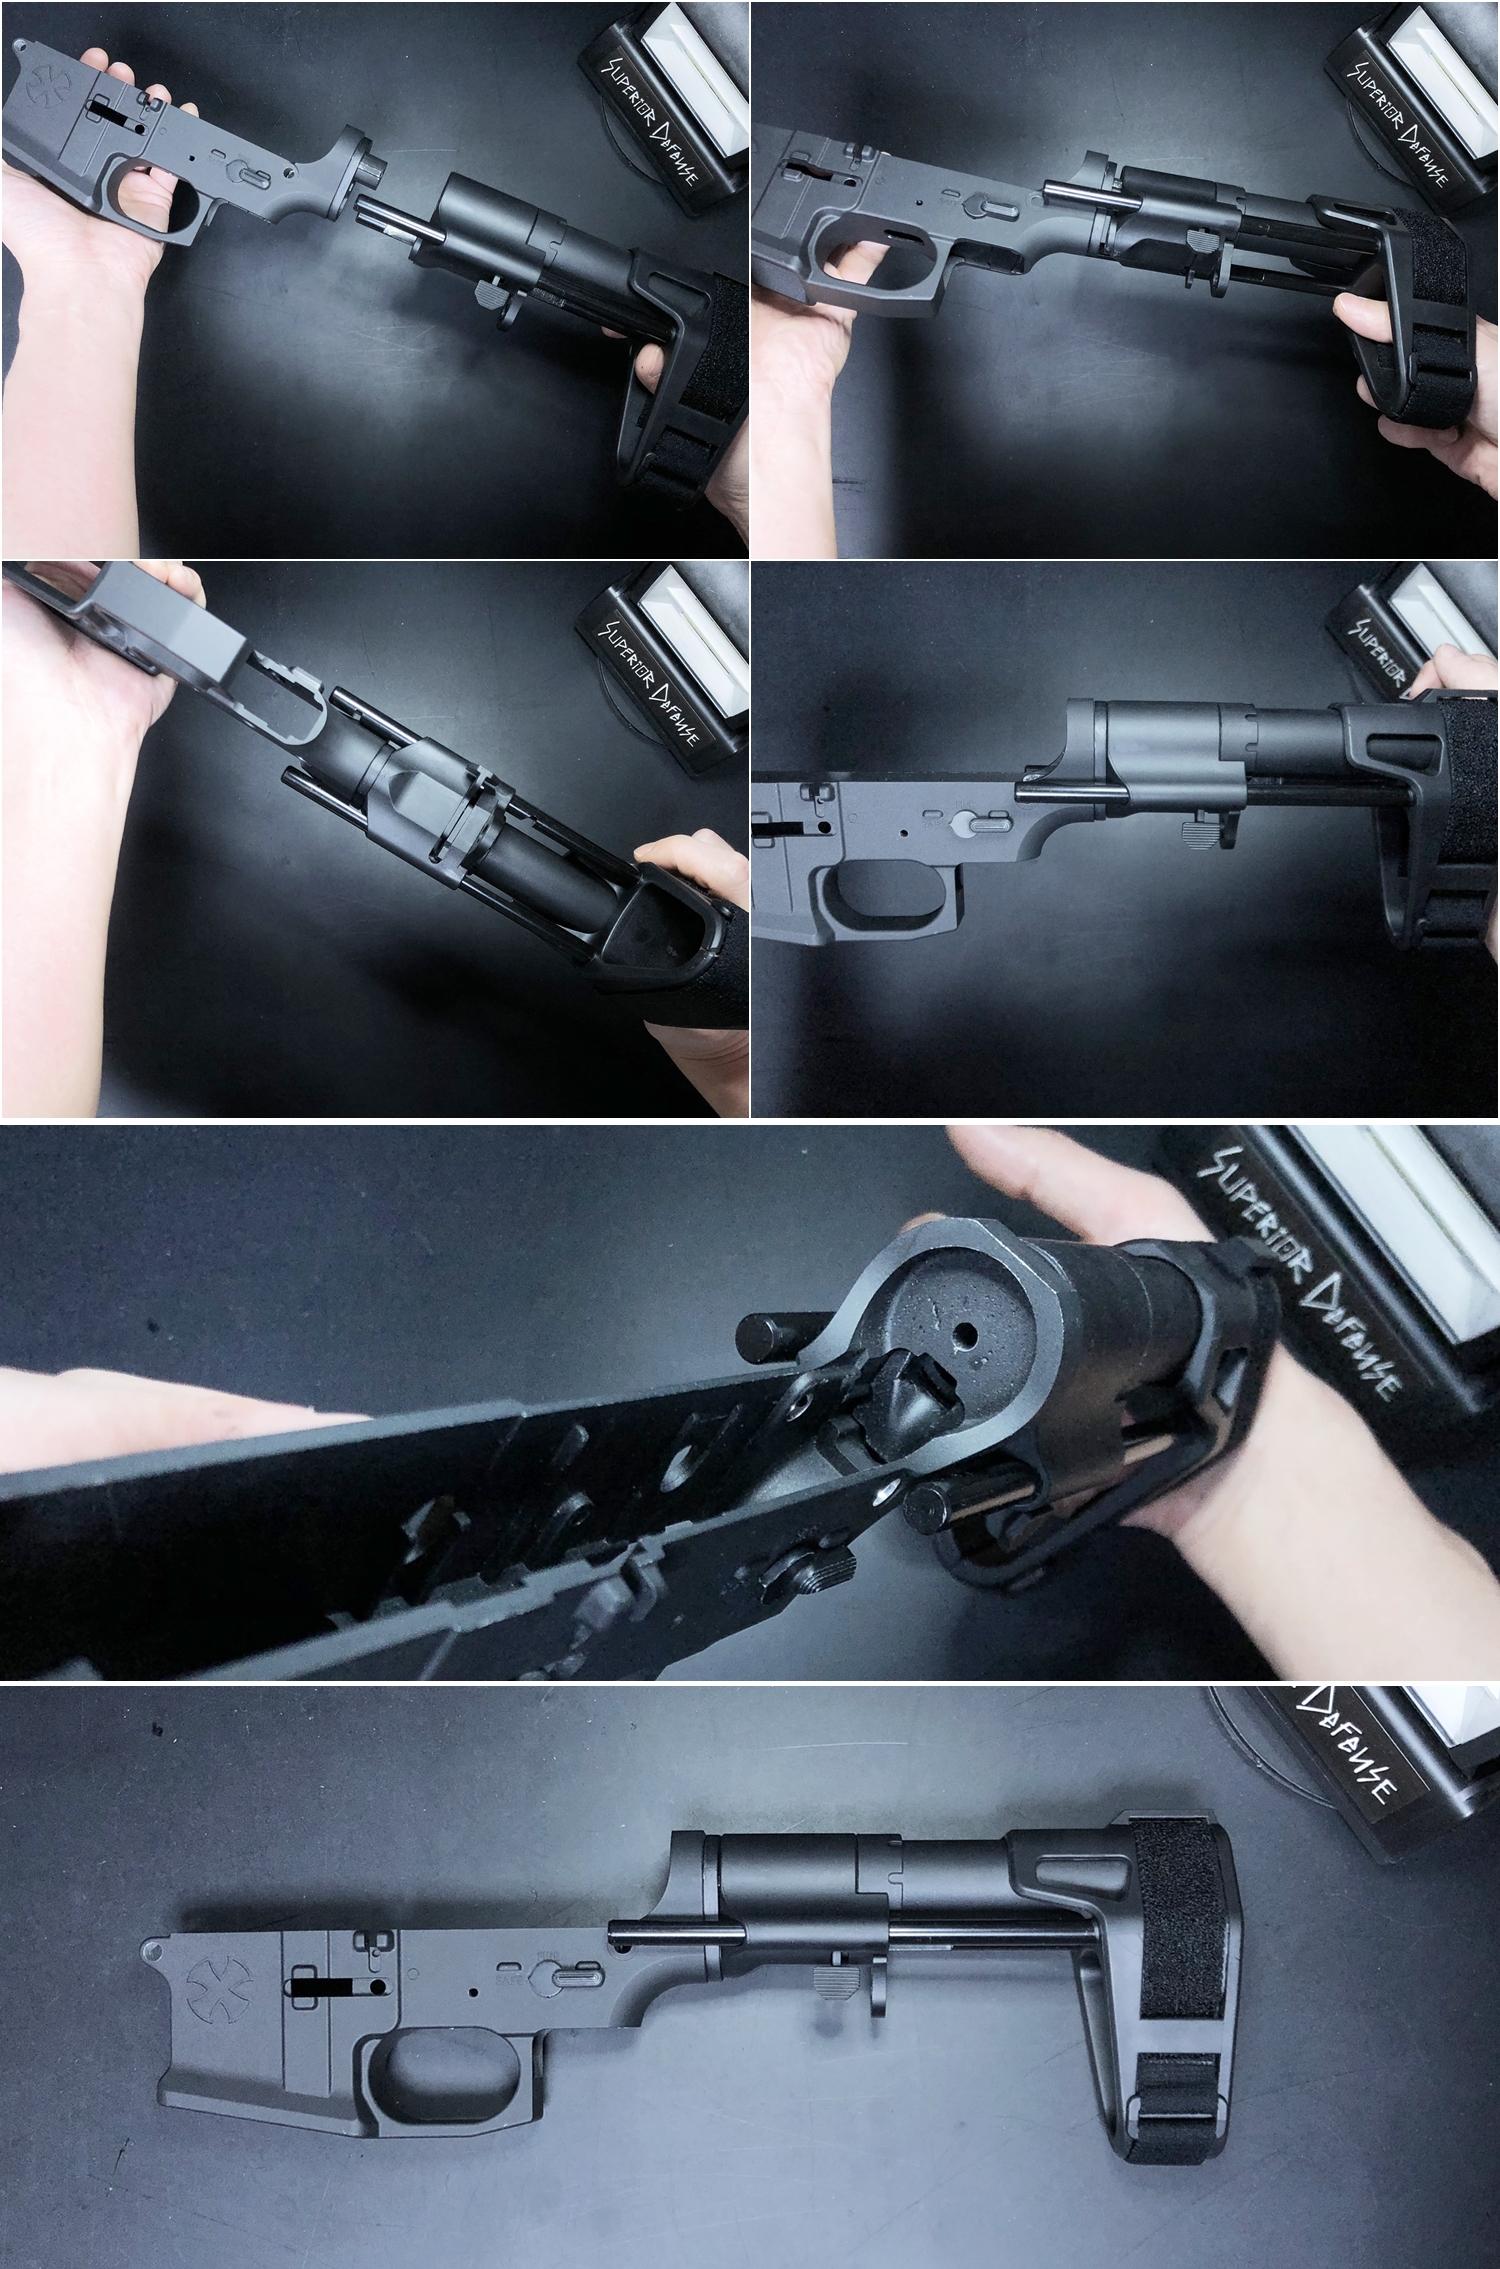 21 SB TACTICAL SB-PDW TYPE!! ちょっと気になって 購入~検証~DIY してみた!! STD電動ガン専用 M4 AR-15 スタビブレース バットストック & NOVESKE GEN3 MB専用 ポン付け ストック スリング プレート作製!!